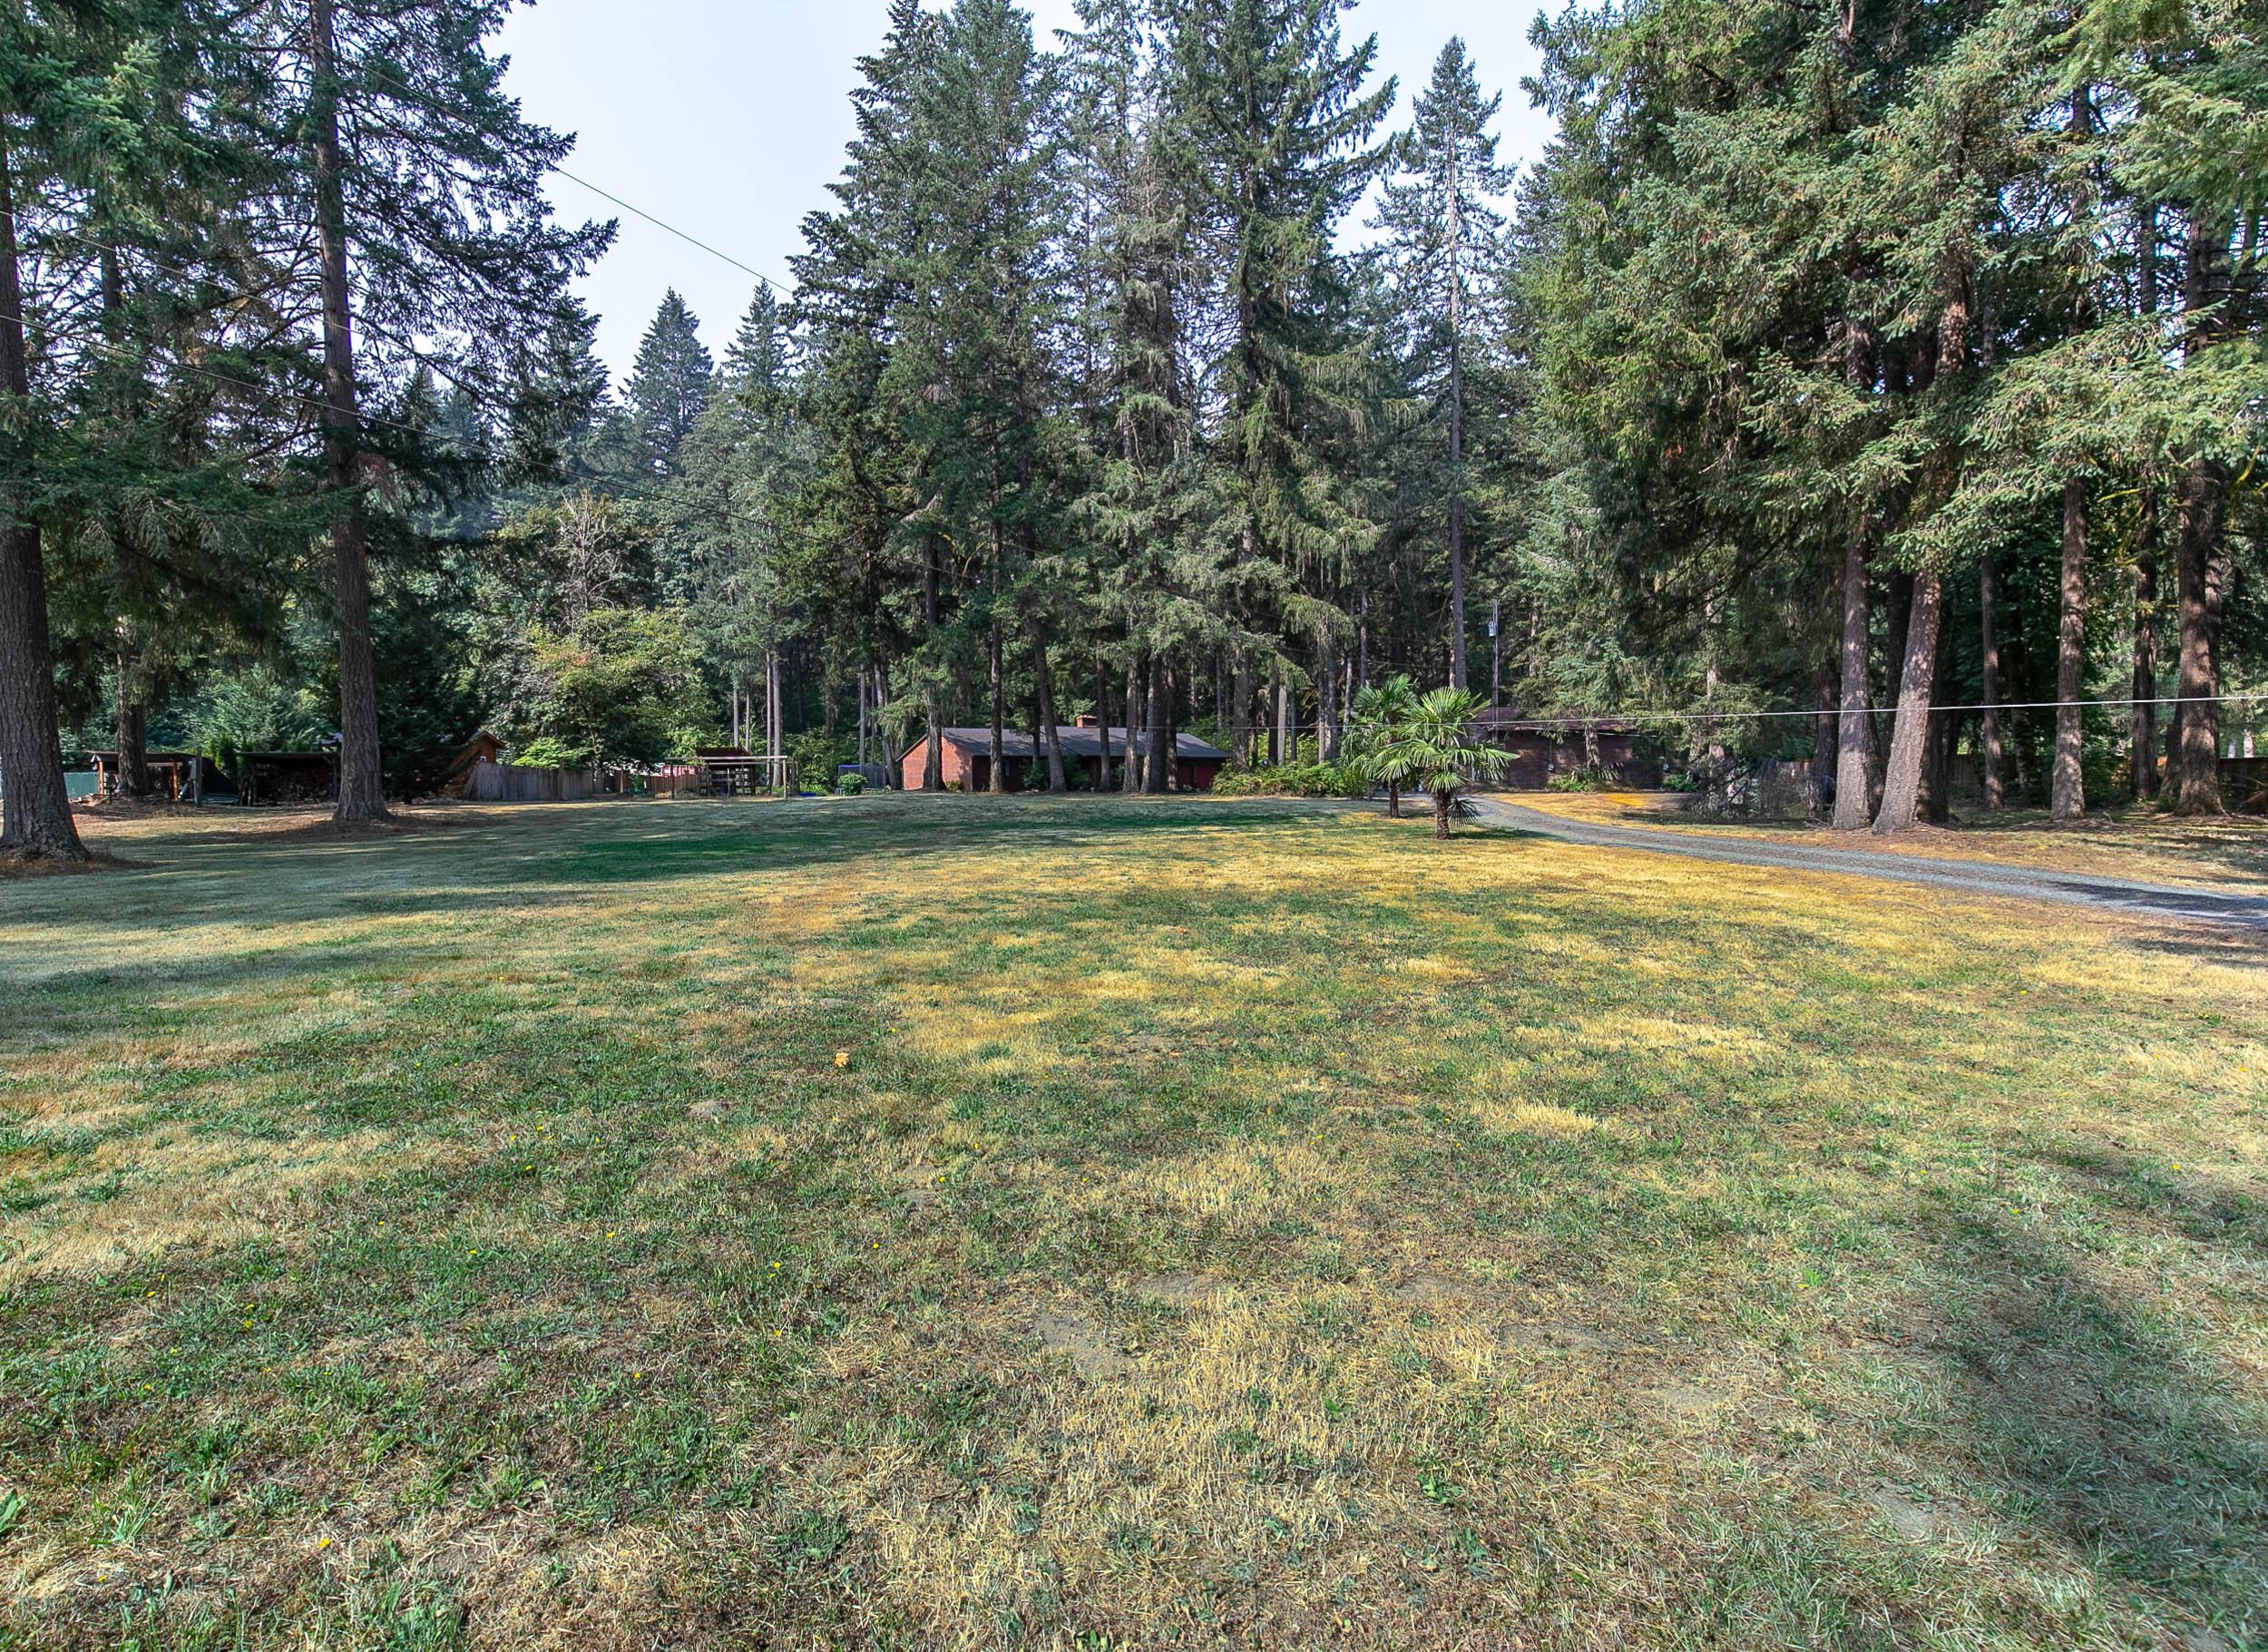 002_16181 S Eaden Rd Oregon City_MG_6635-HDR.jpg